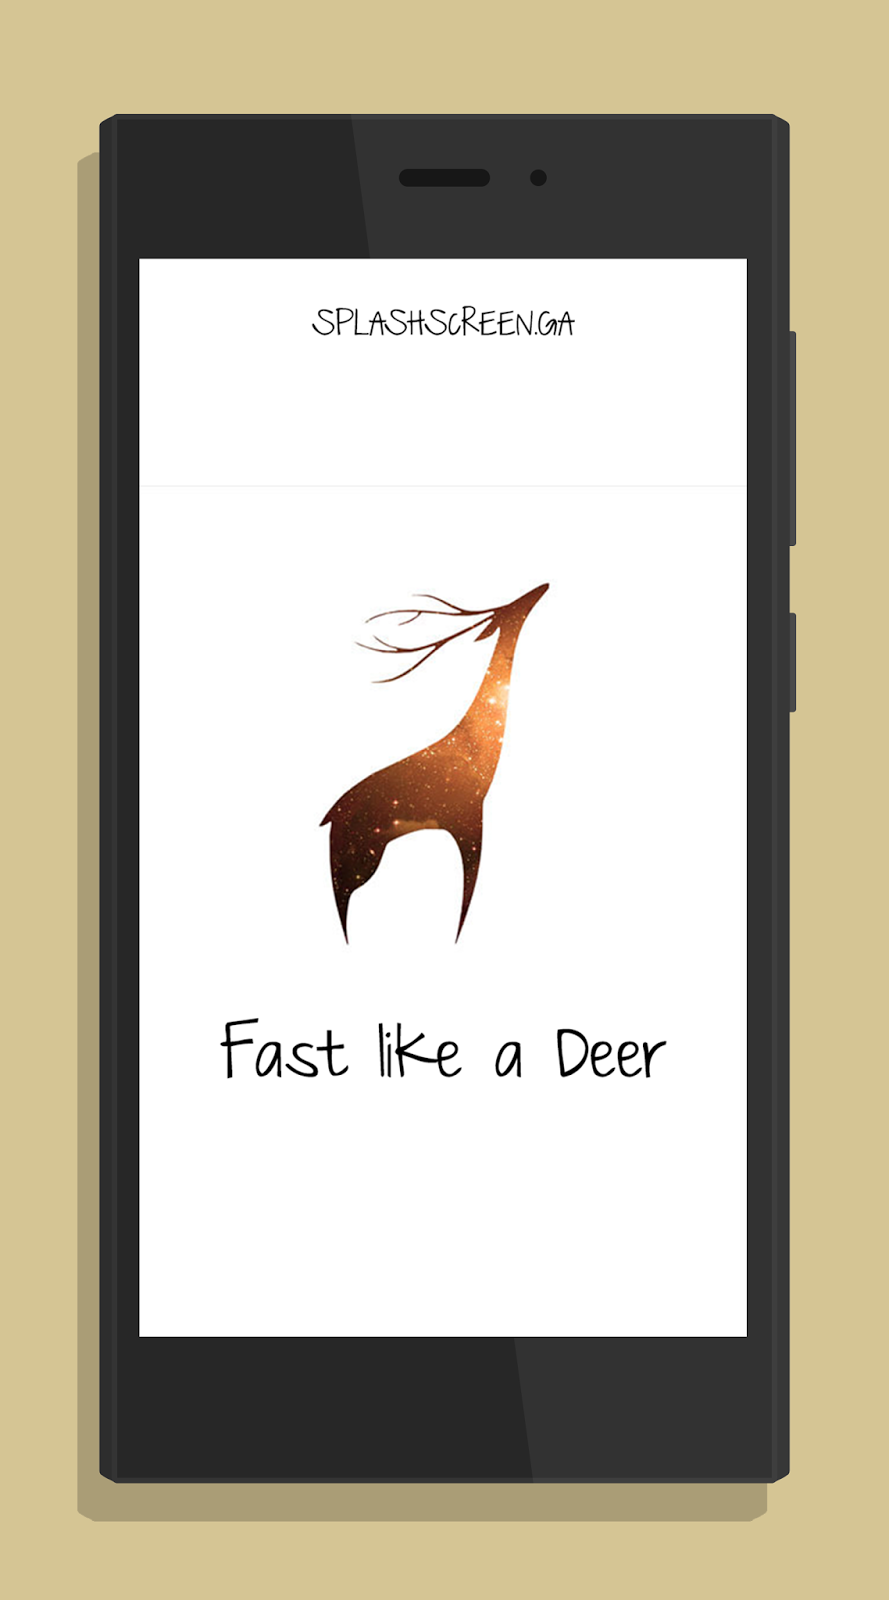 Splashscreen Deer Xiaomi Redmi 2